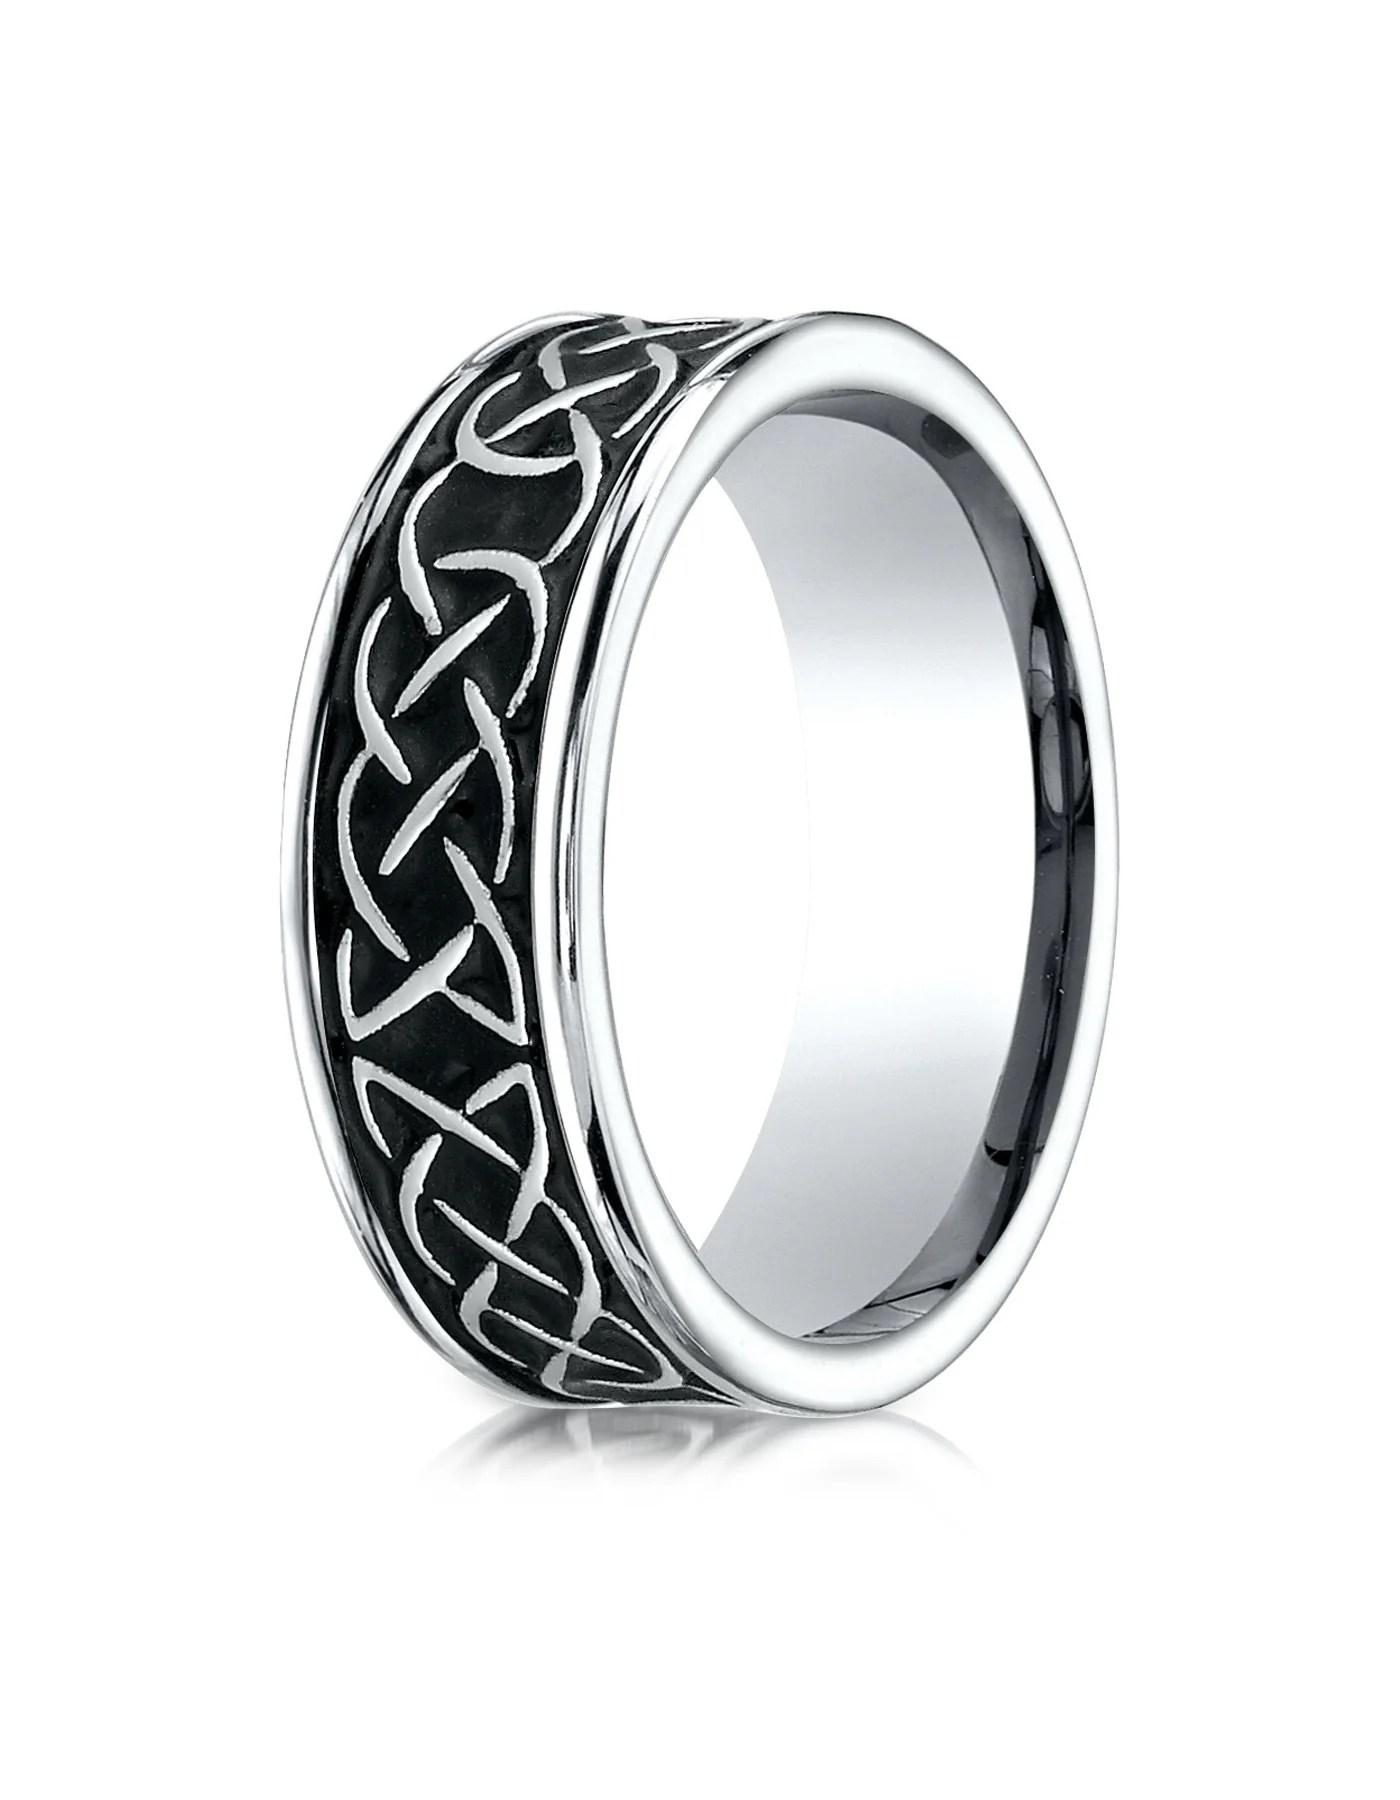 dundee cobalt celtic knot wedding band for men by benchmark cobalt wedding rings DUNDEE Cobalt Celtic Knot Wedding Band for Men by Benchmark